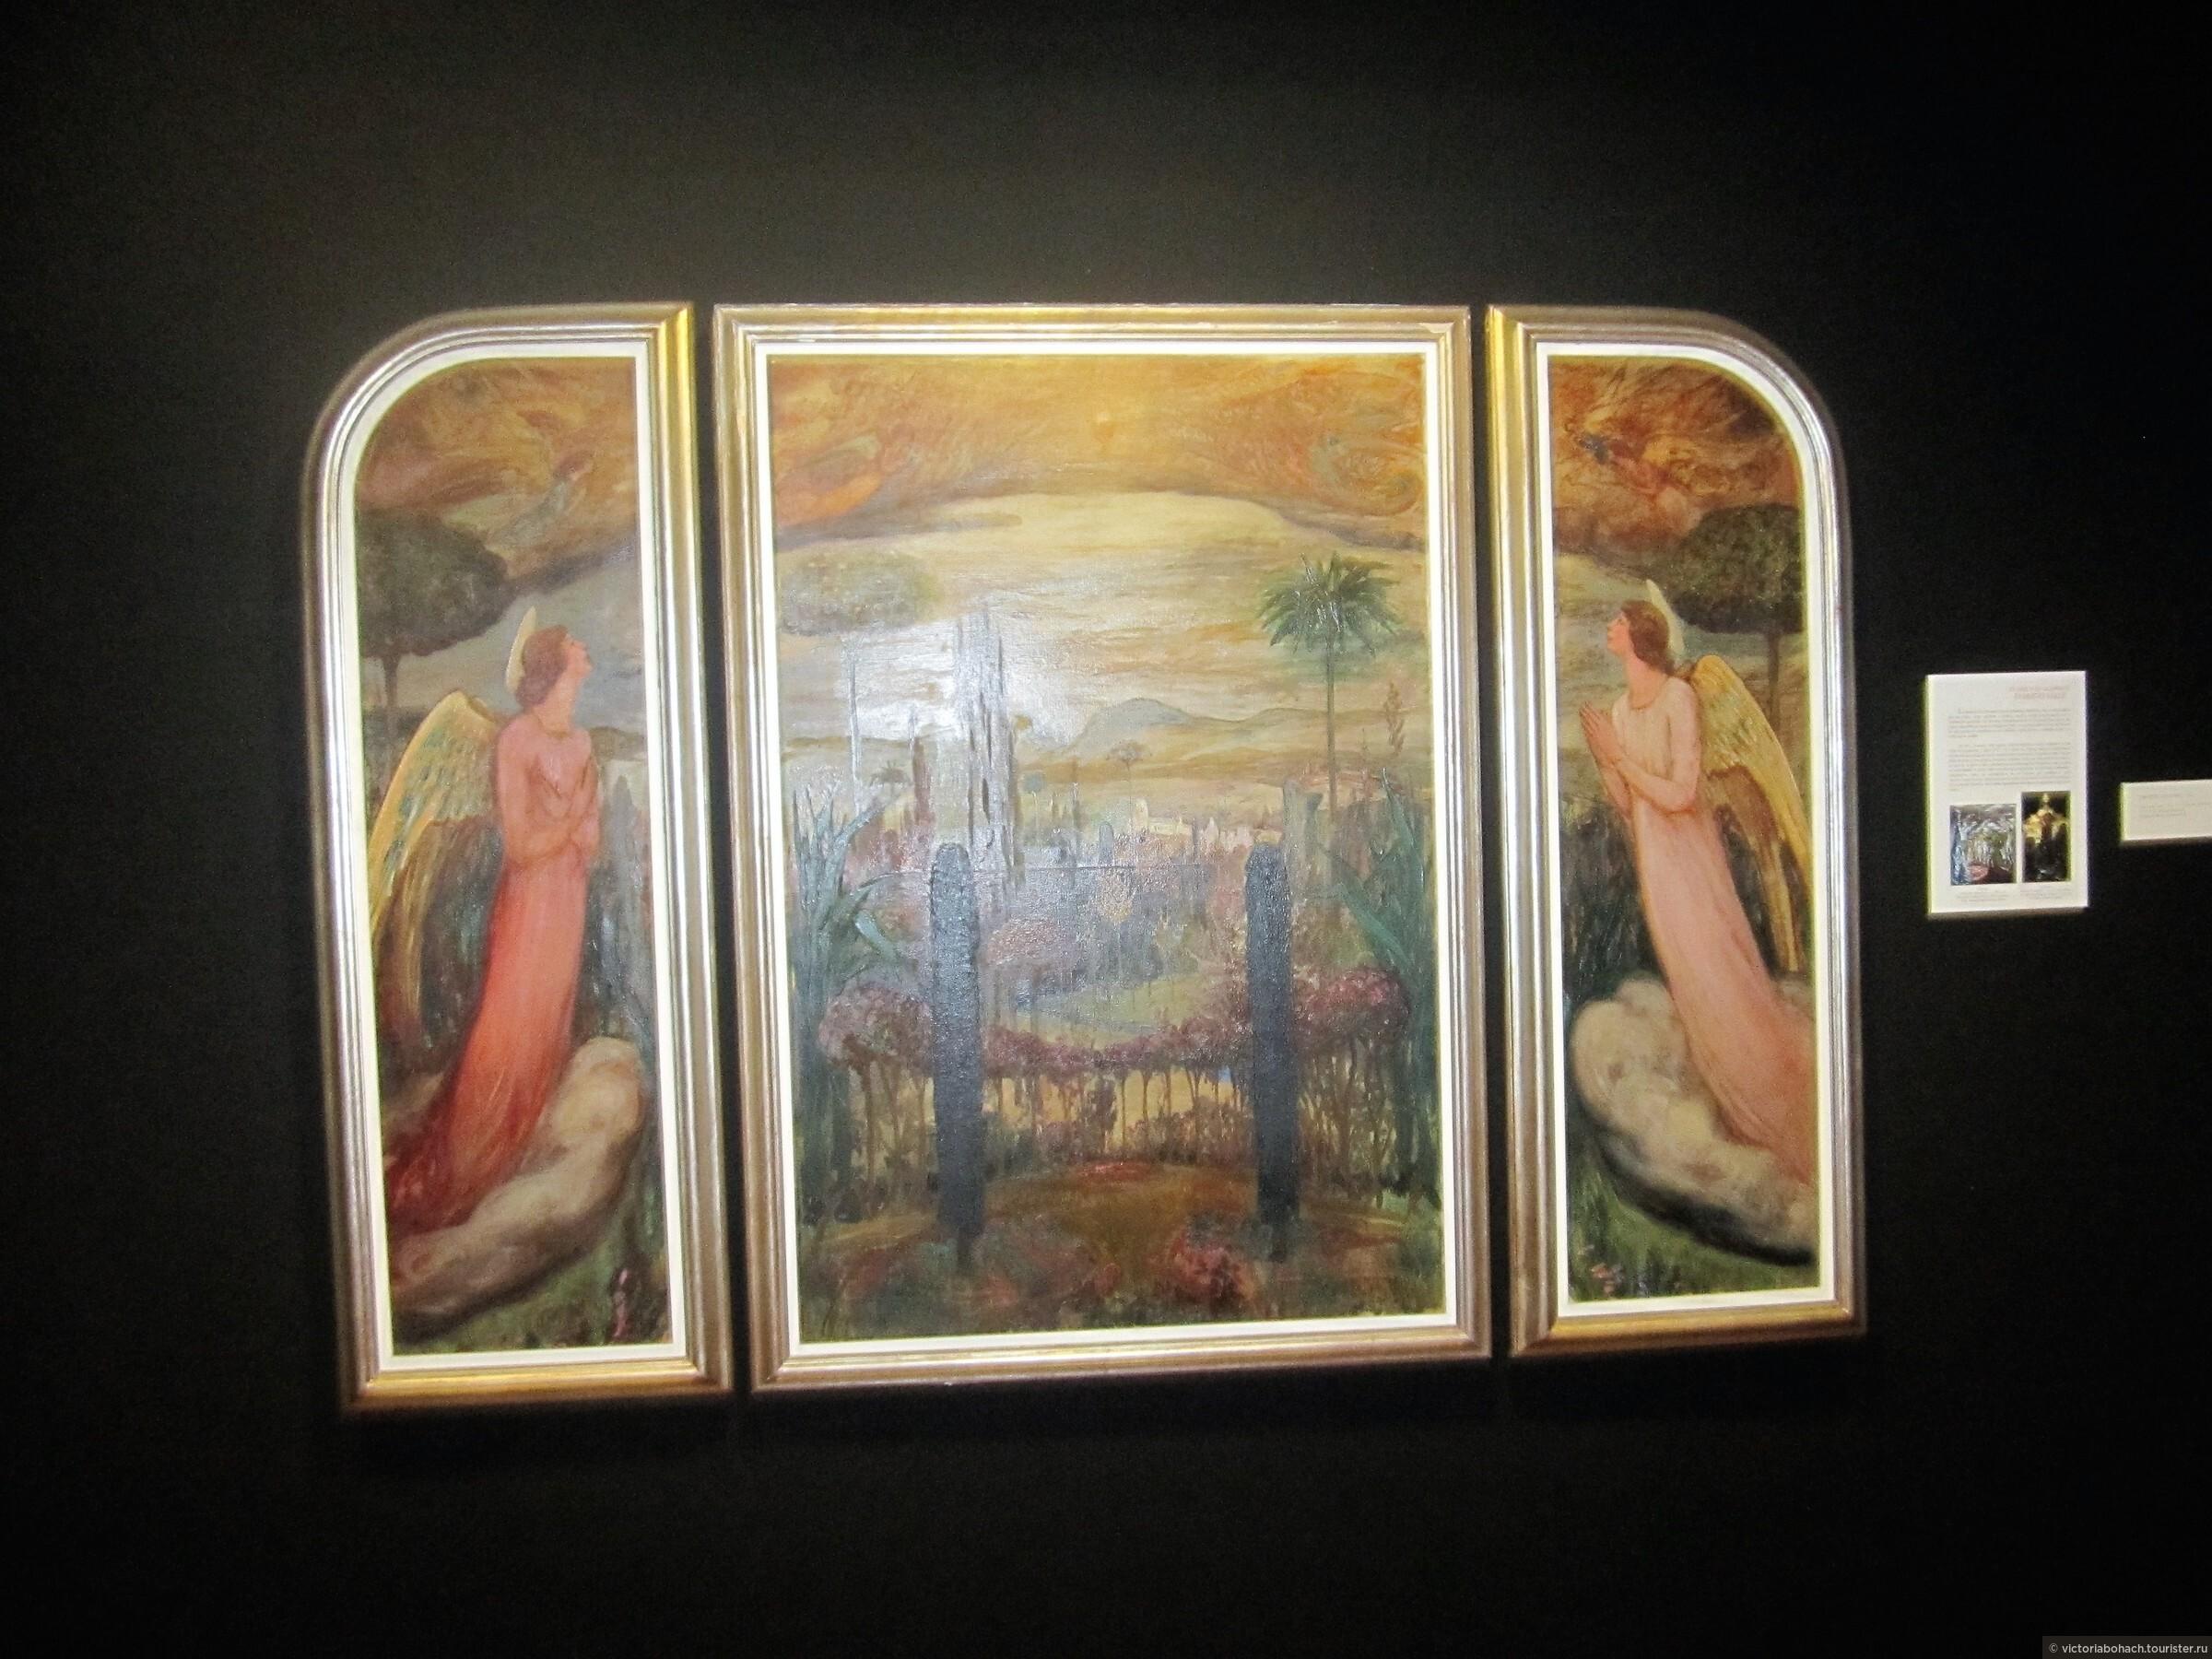 "Фото из альбома ""Усадьба - музей Эваристо Вайе в Хихоне"", Хихон, Испания"